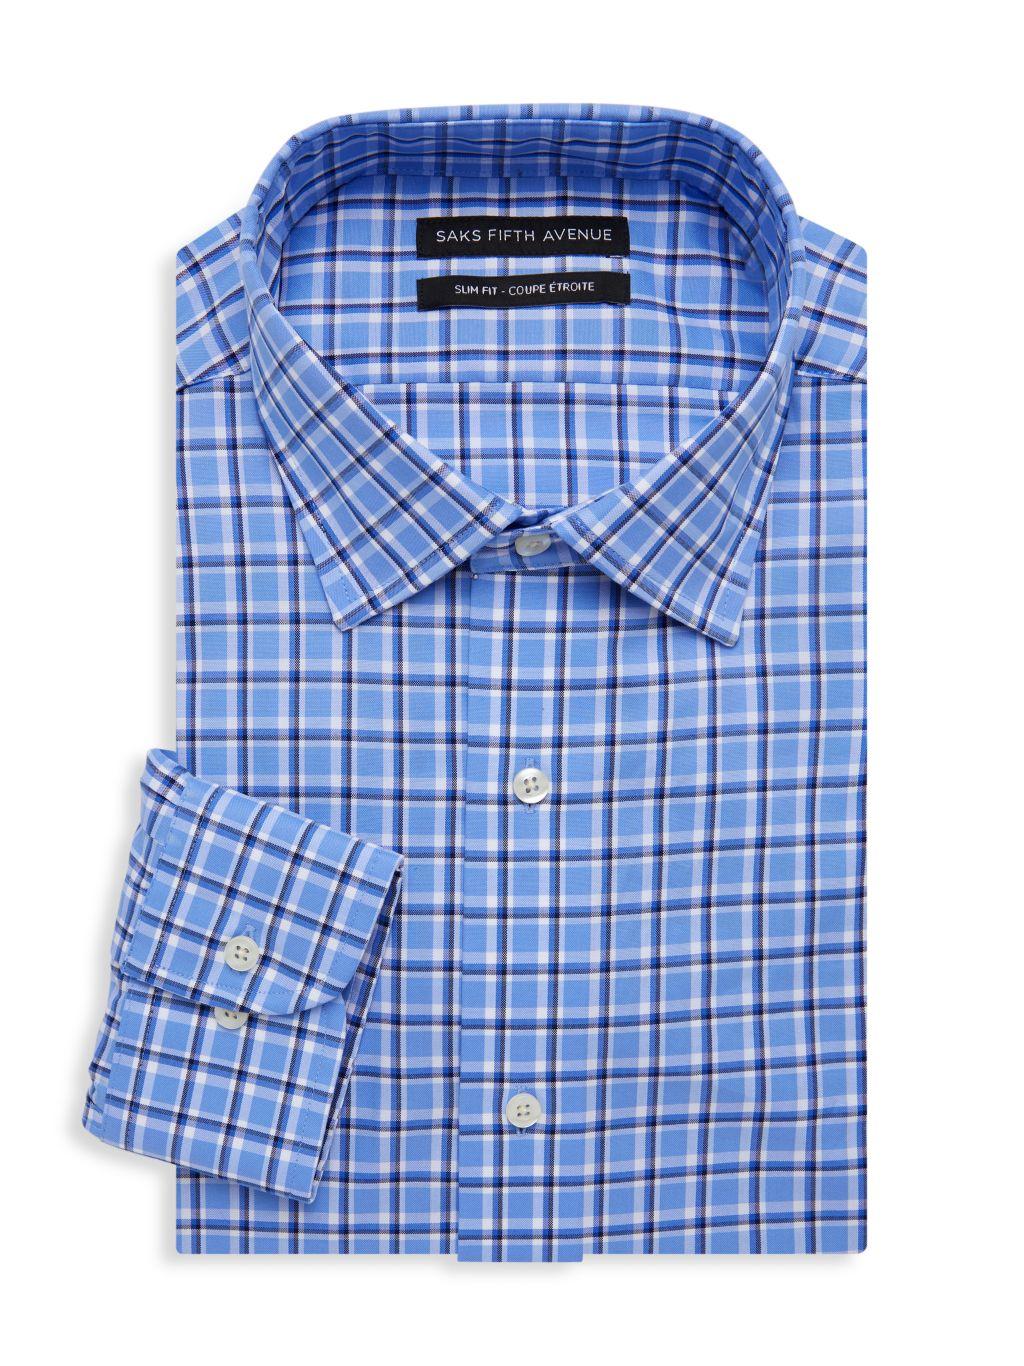 Saks Fifth Avenue Slim-Fit Check Dress Shirt